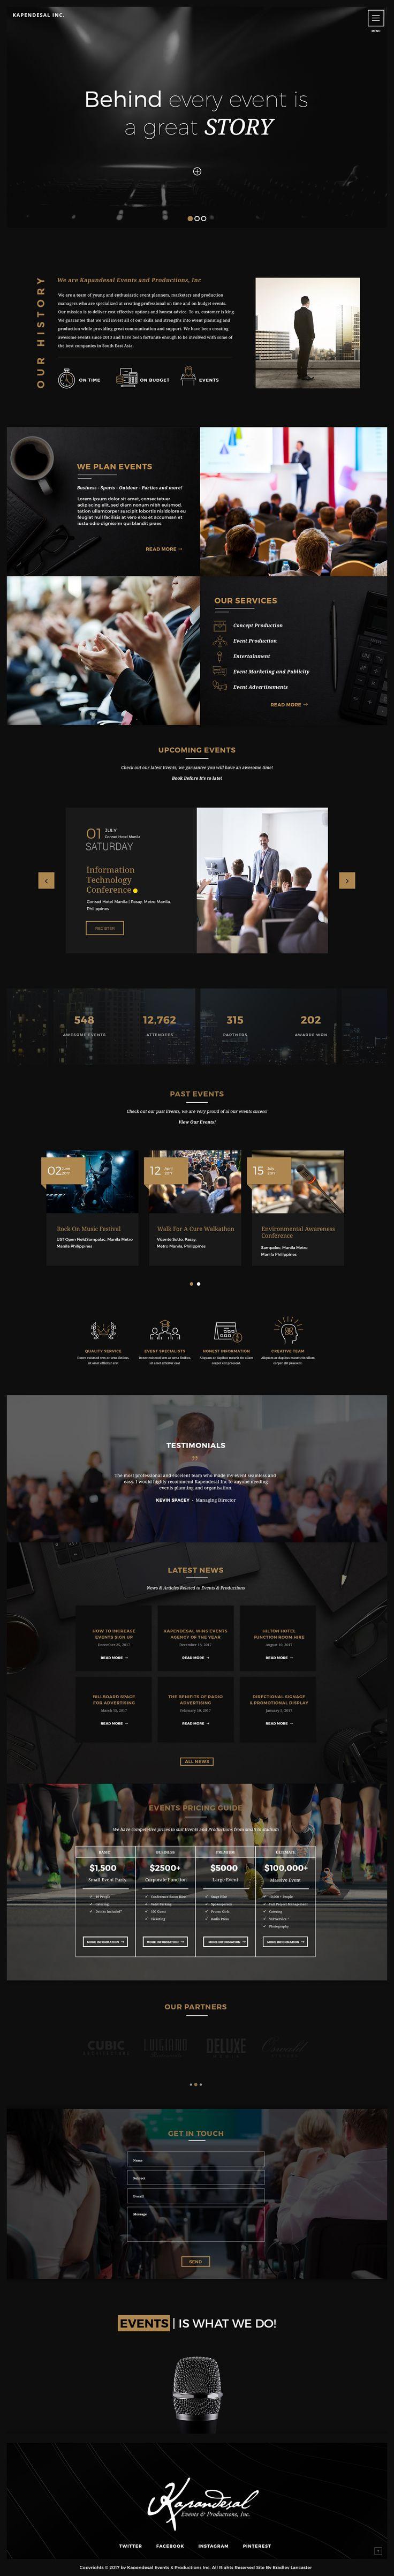 Events Agency Landing Home Page Website Design Dark Theme UI        Designed by Bradley Lancaster  www.bradleylancaster.com    #branding #corporate #design  #events #flat #landing #page  #minimal #production #ui #ux  #website